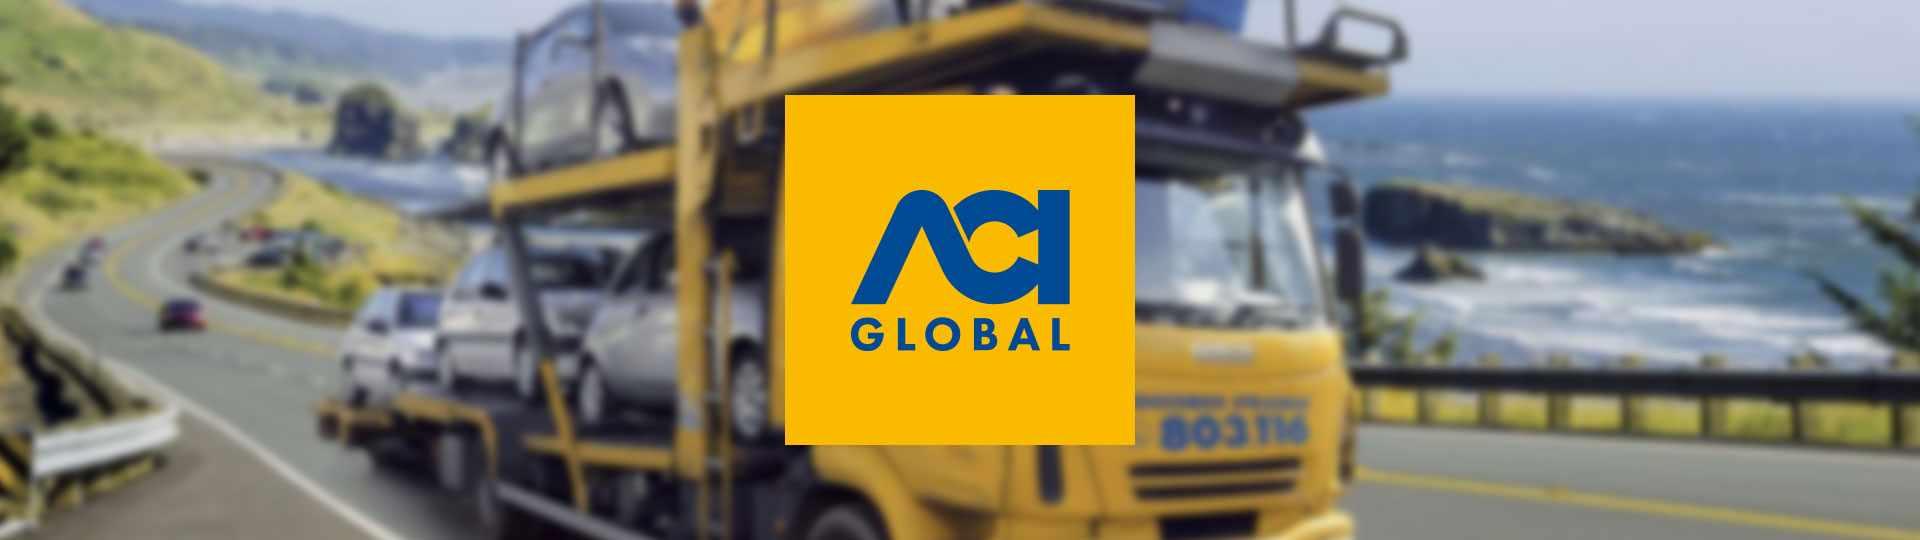 header_aci_global_bonera_group.jpg